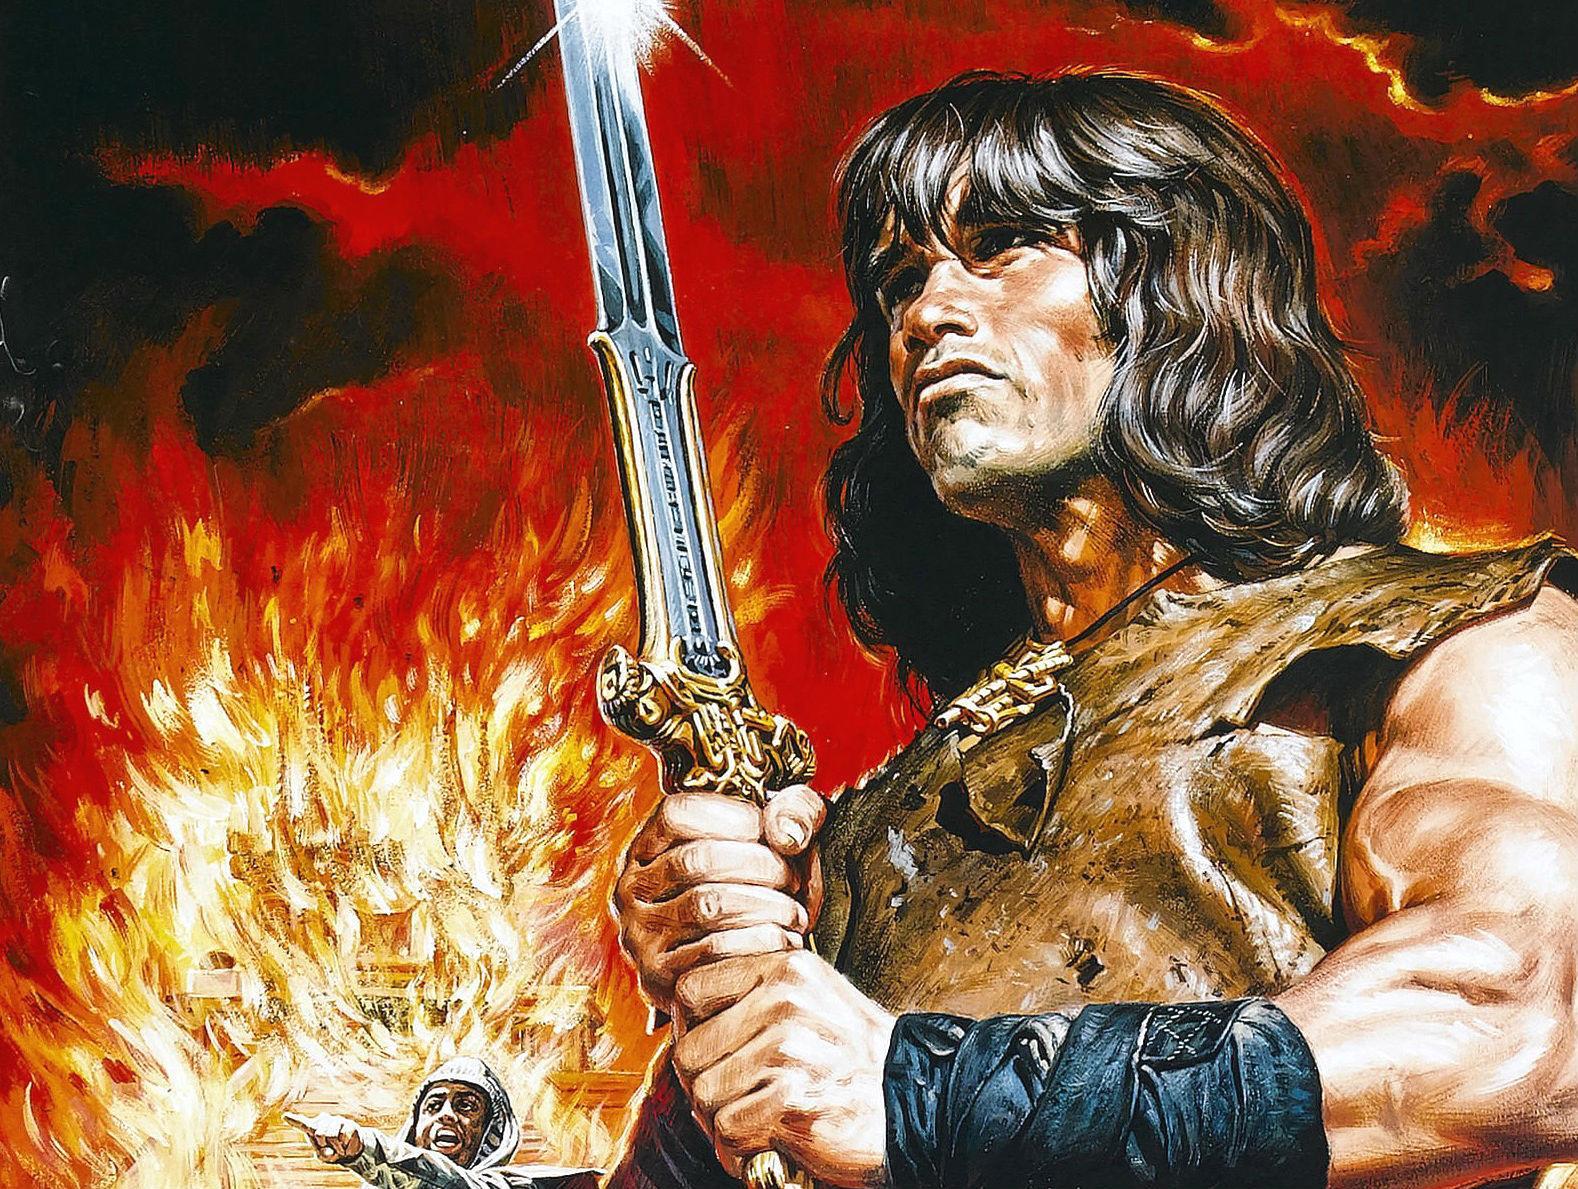 Conan The Barbarian 1982 Wallpapers HD Download 1578x1189